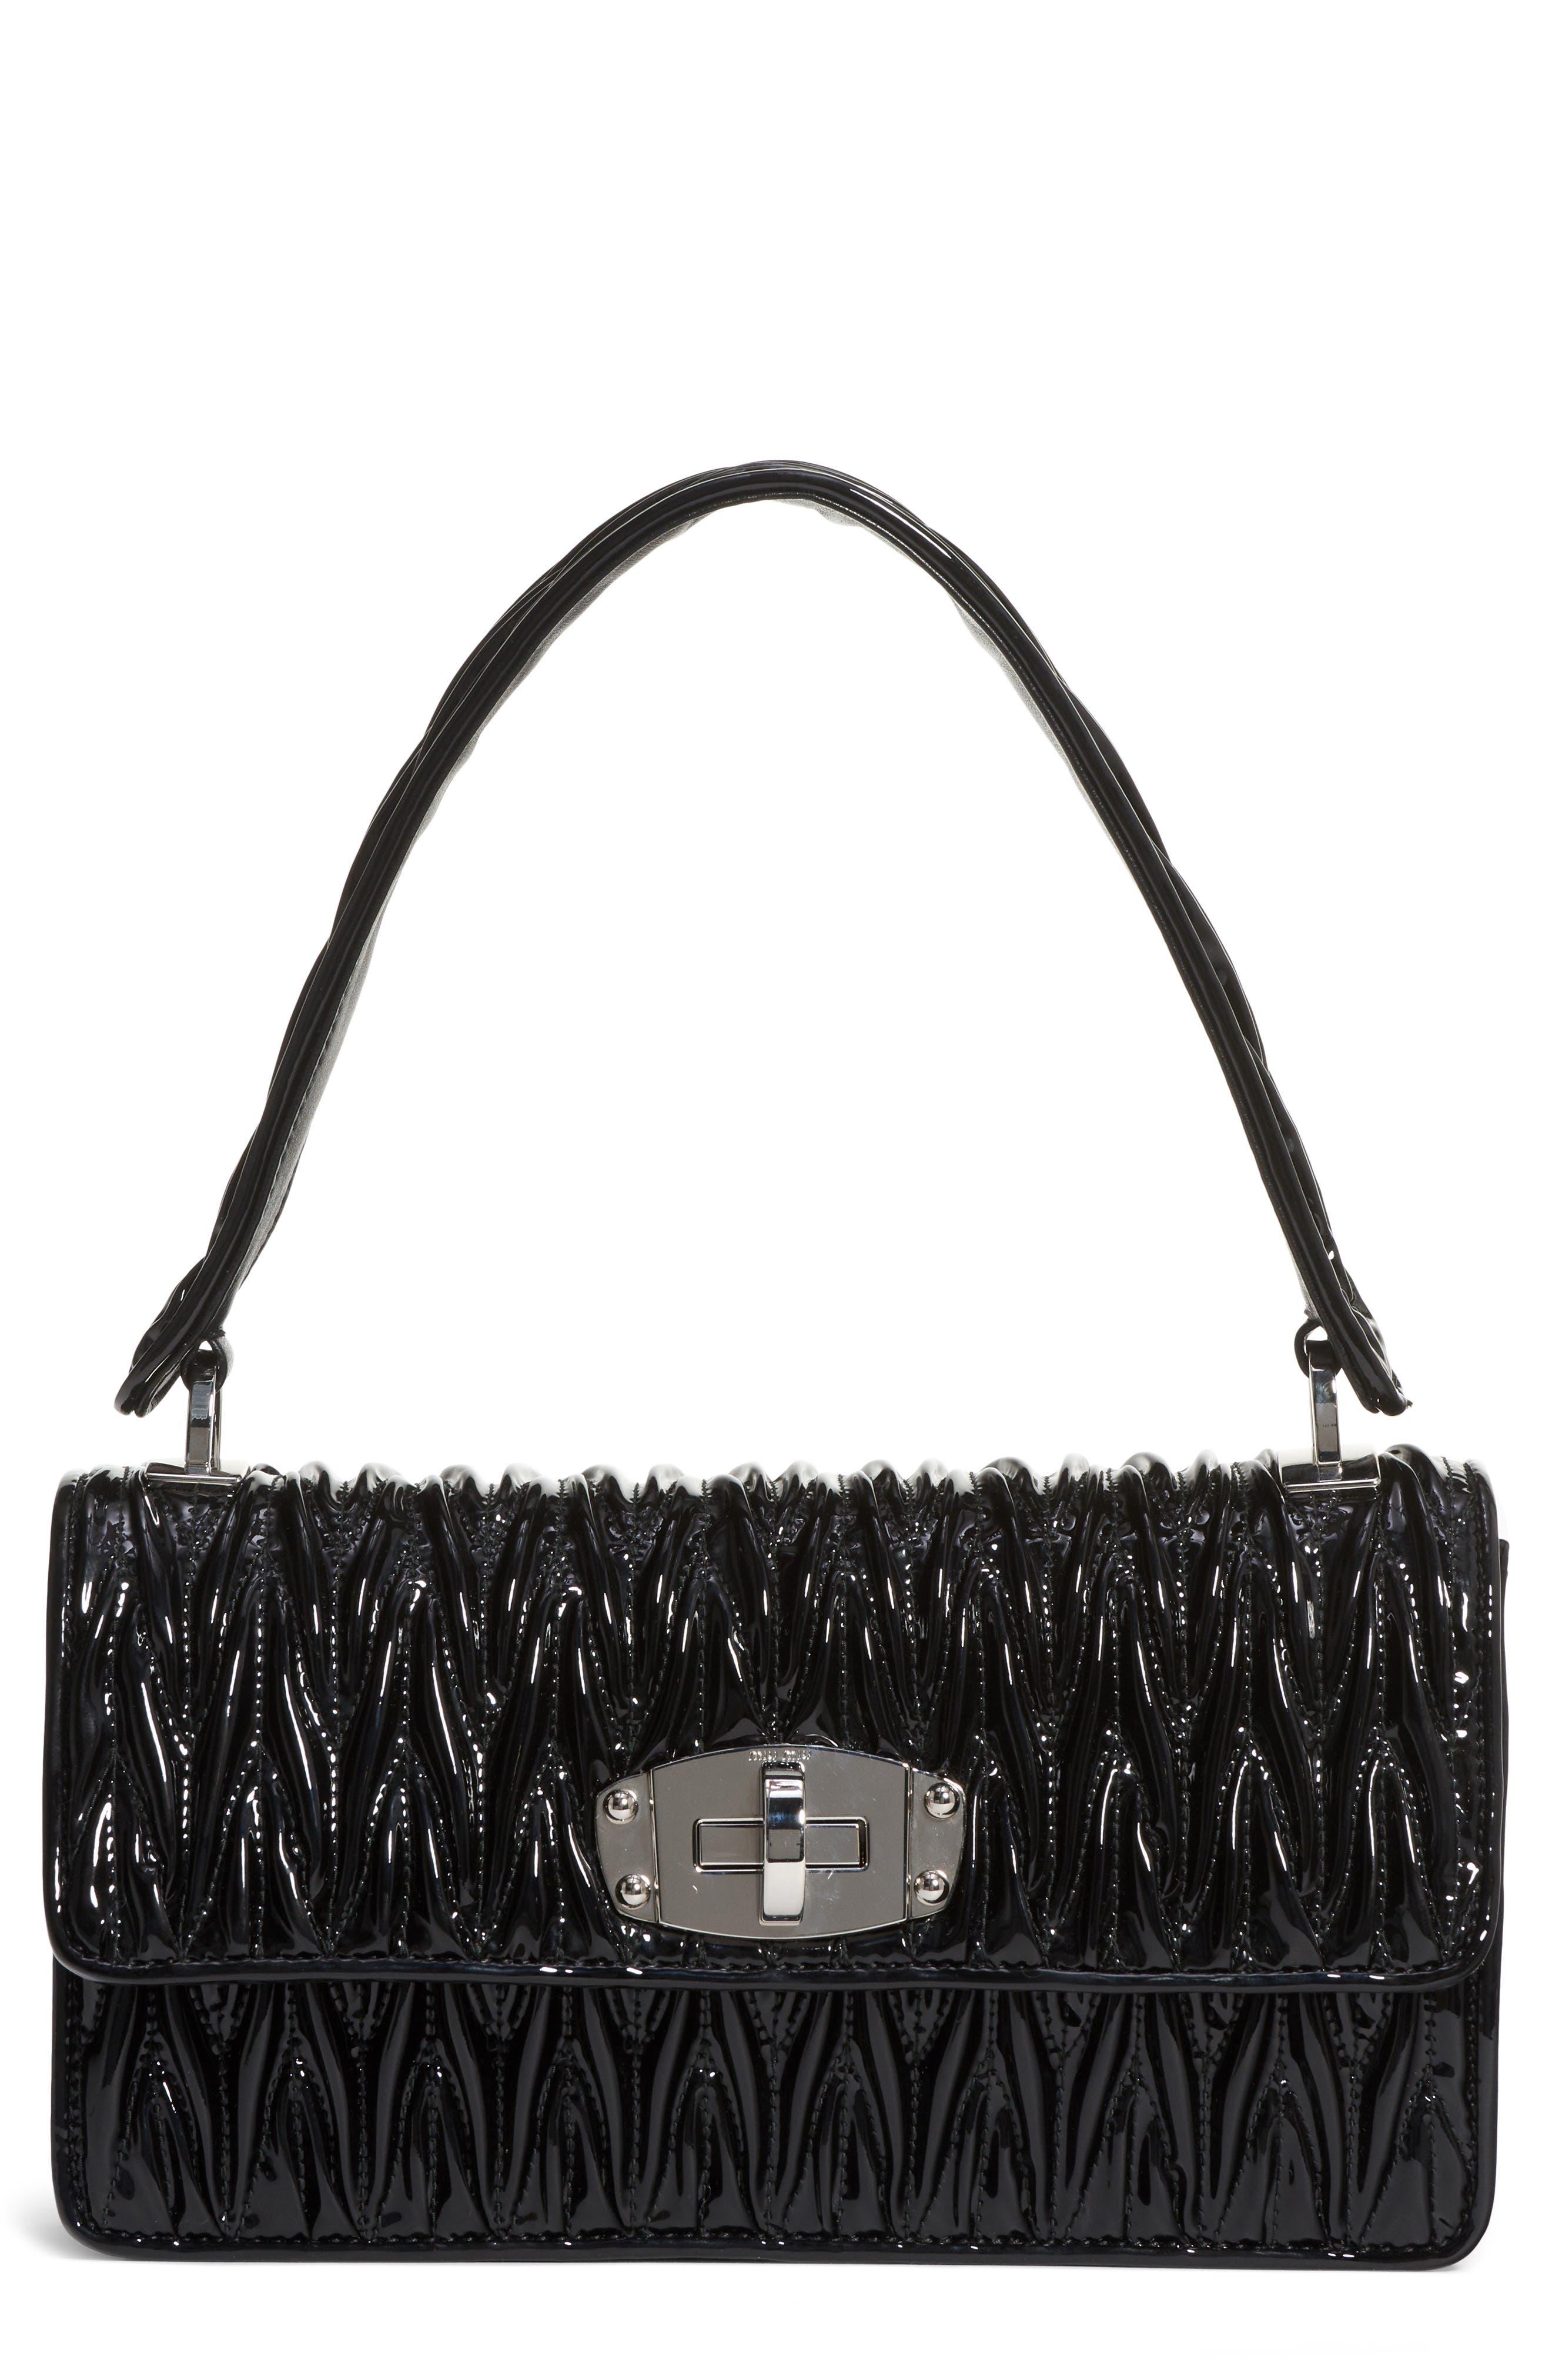 Vernice Matelassé Quilted Leather Shoulder Bag,                         Main,                         color, NERO